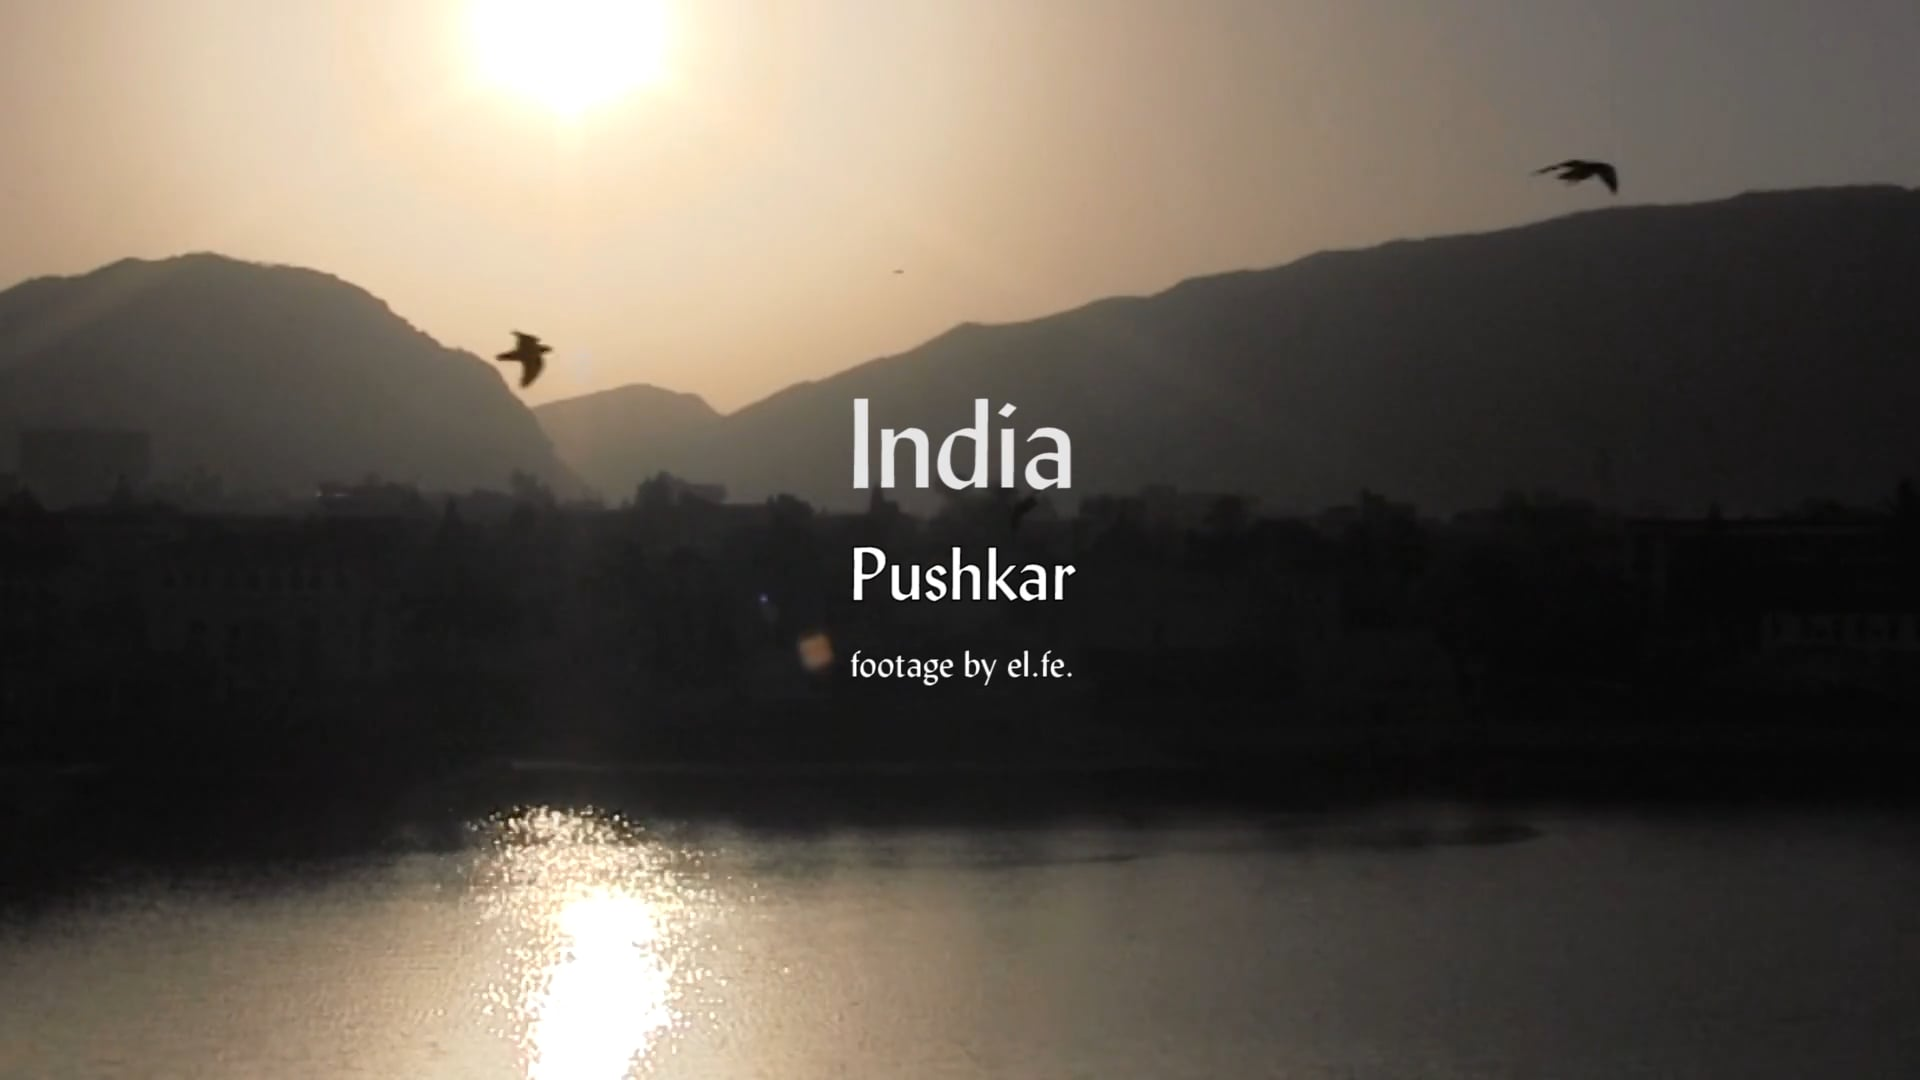 India. Pushkar. footage